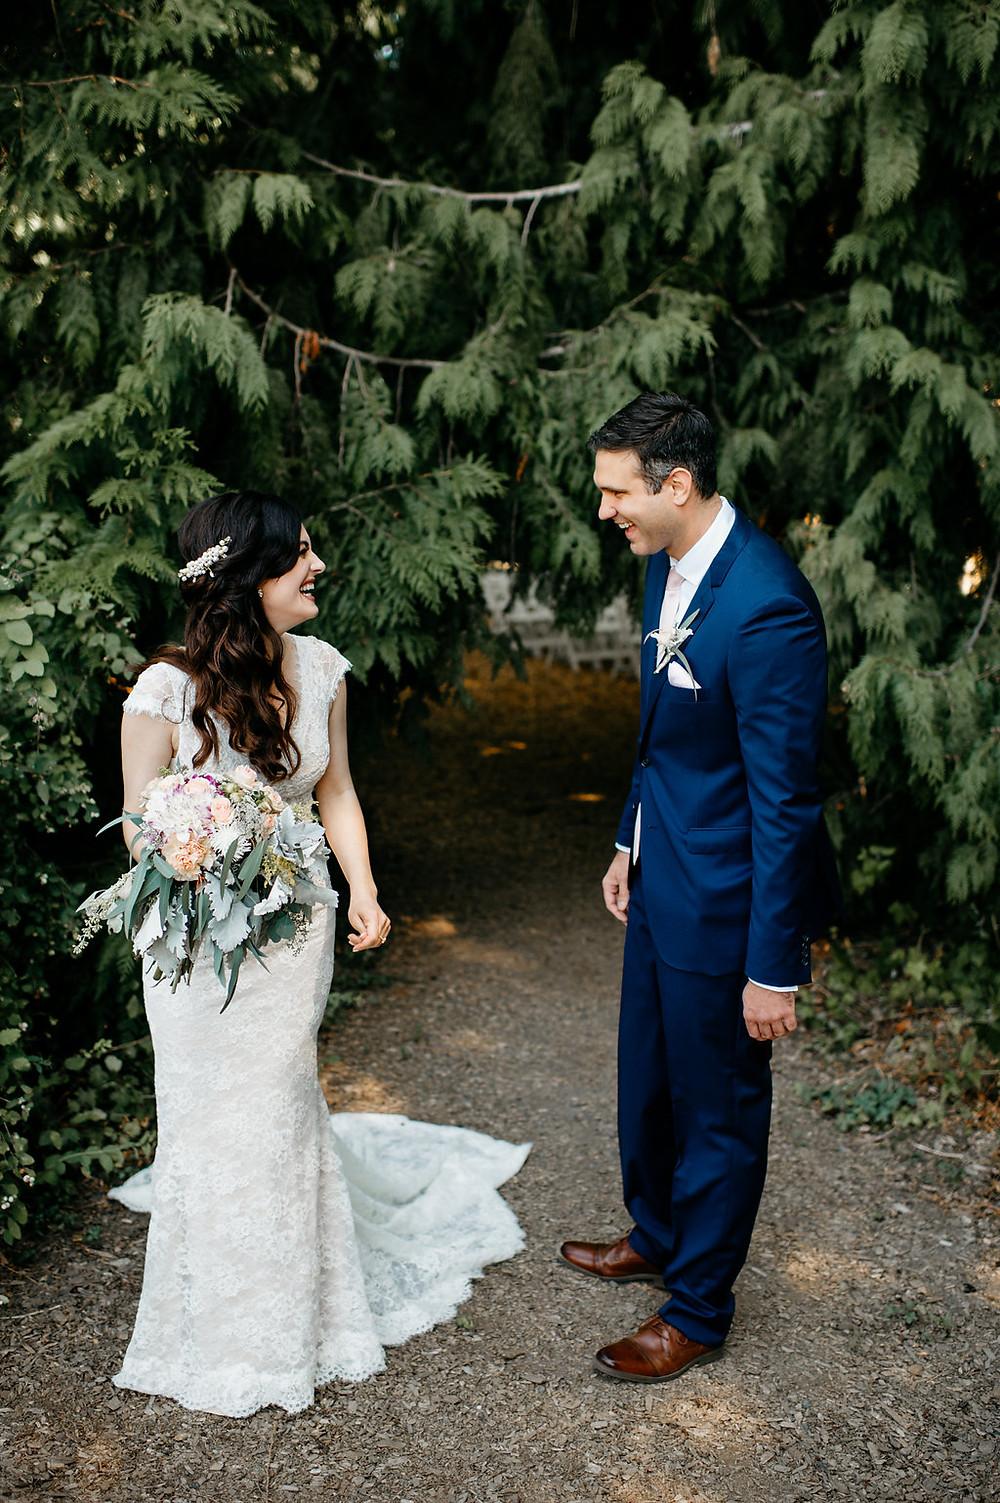 First Look | Twin Willow Gardens | Snohomish, WA Wedding Planner Coordinator